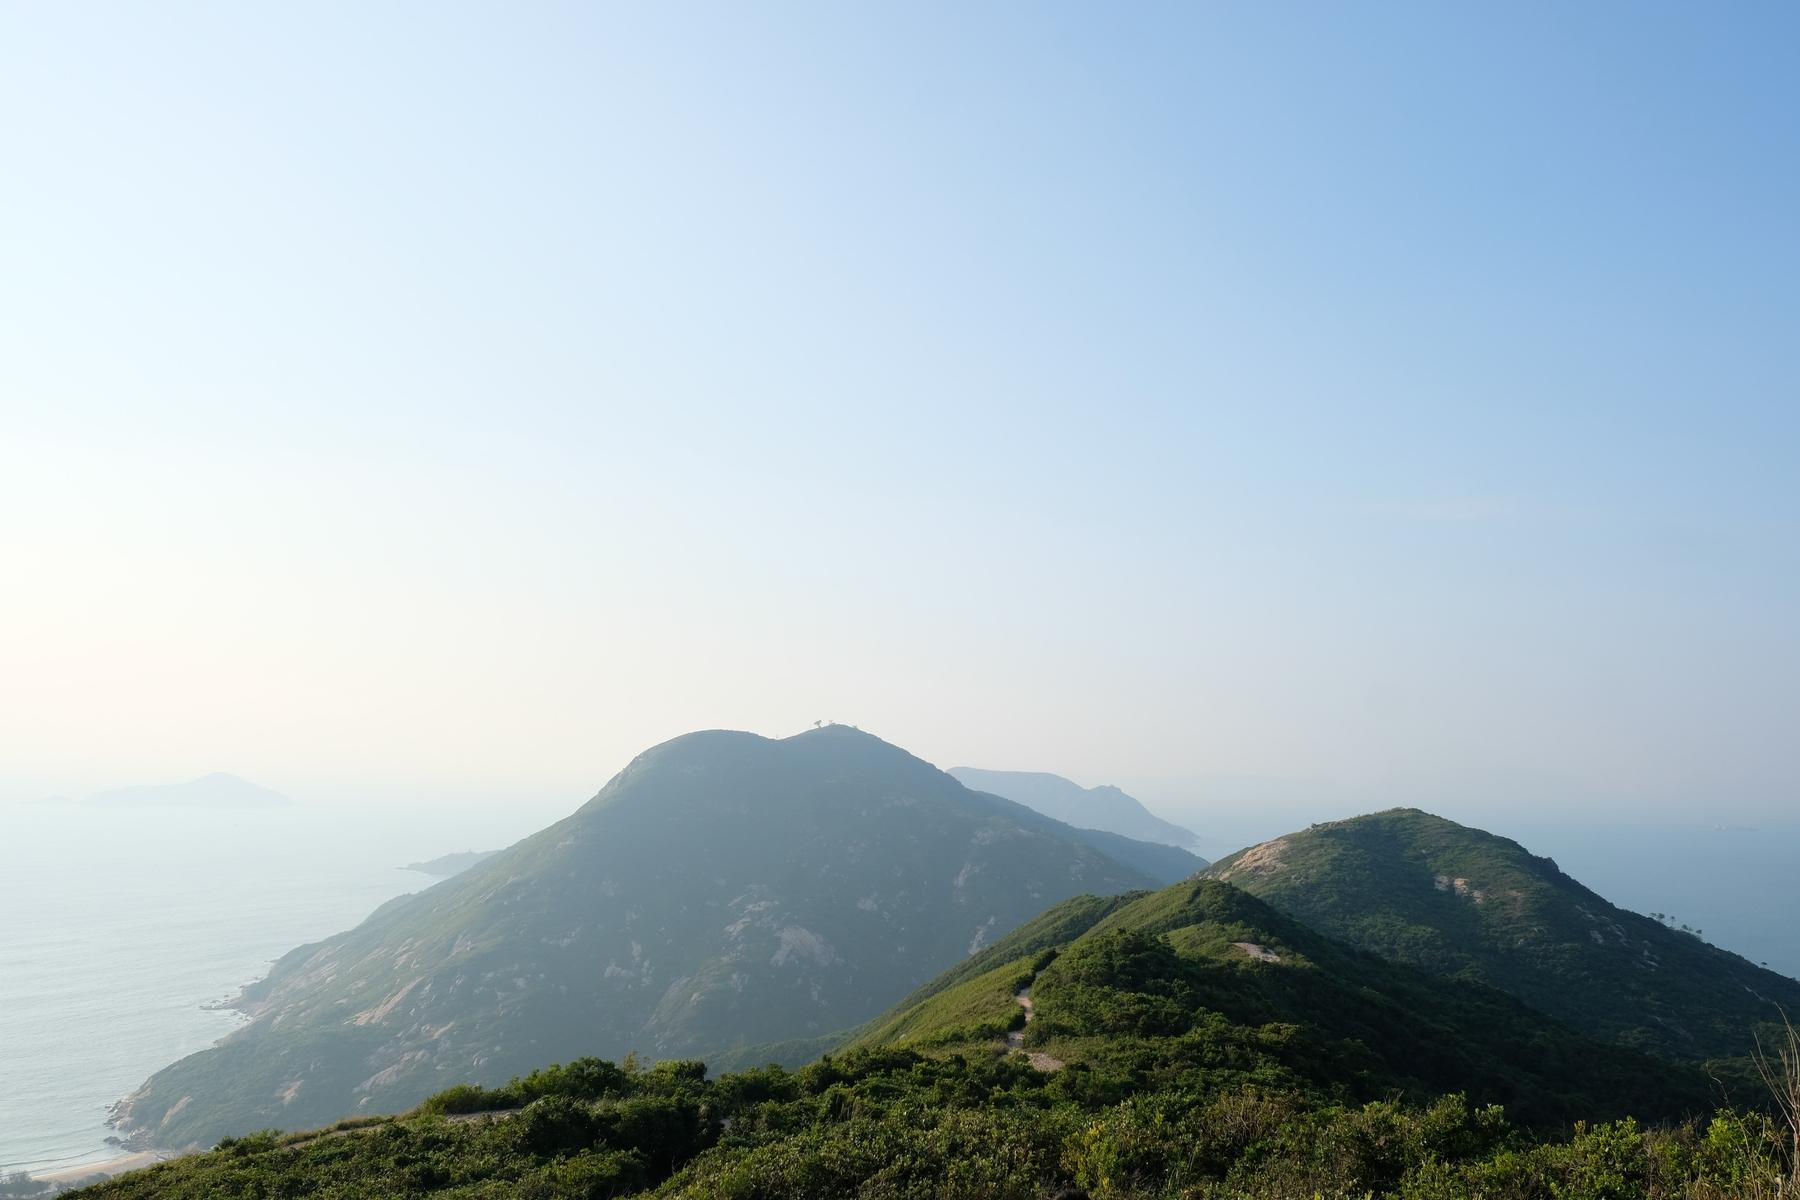 Peak of Dragon's Back hike in Kowloon, HK. Blue and foggy sky.